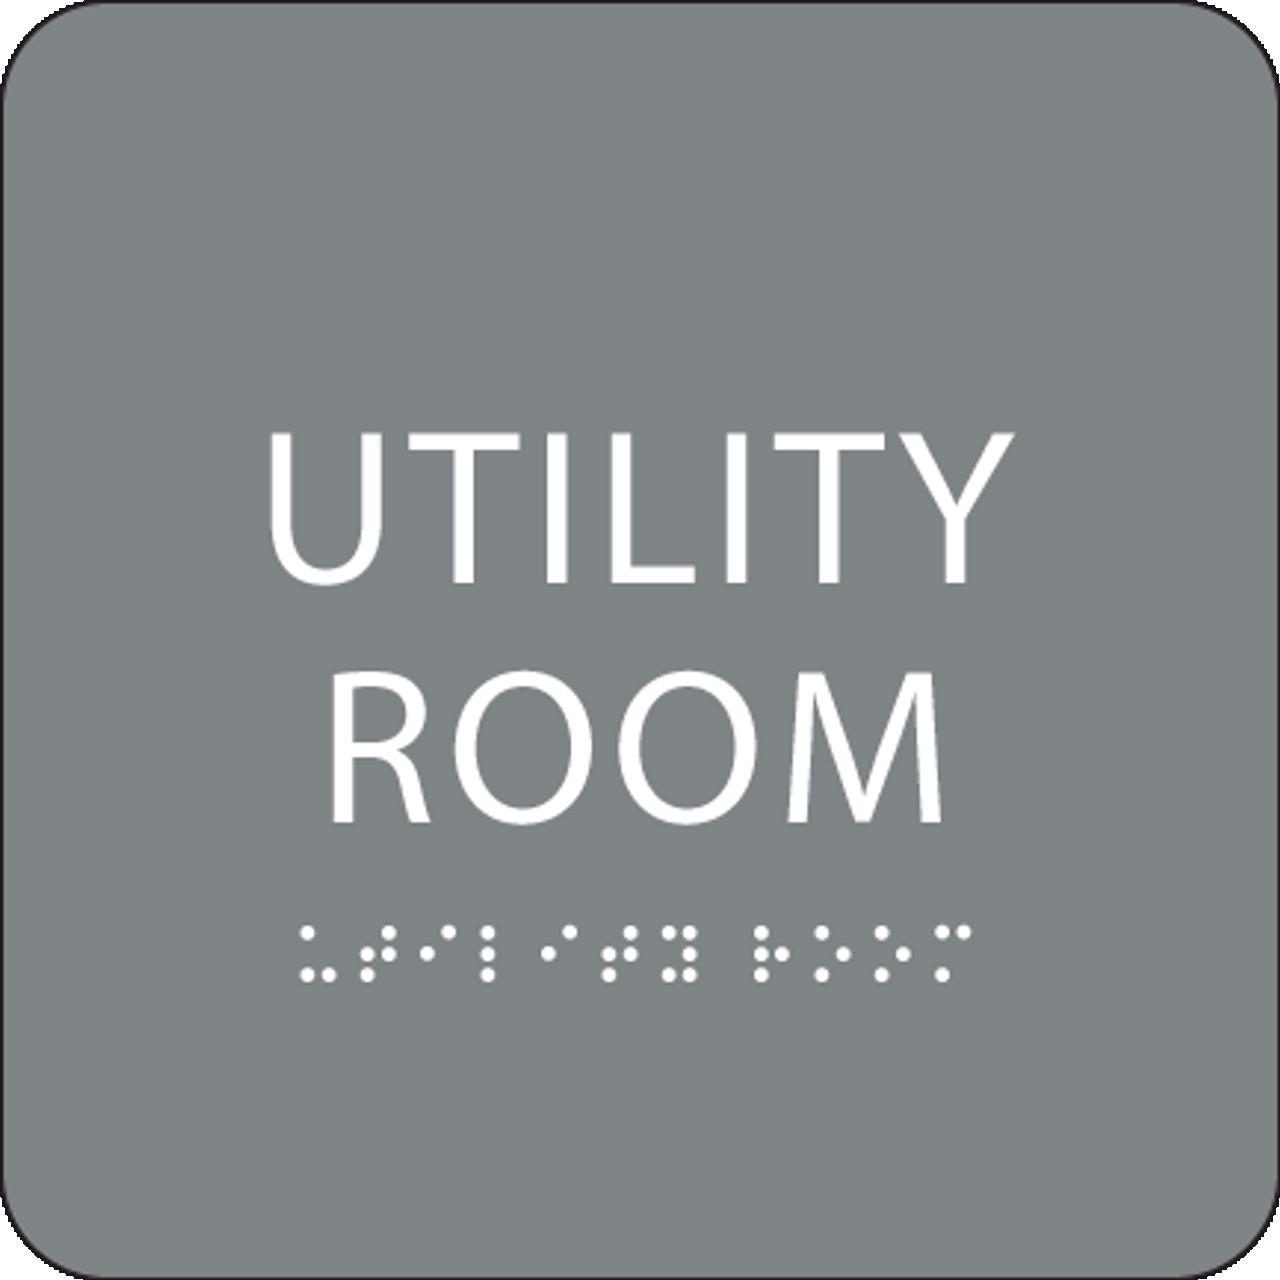 Grey Utility Room ADA Sign